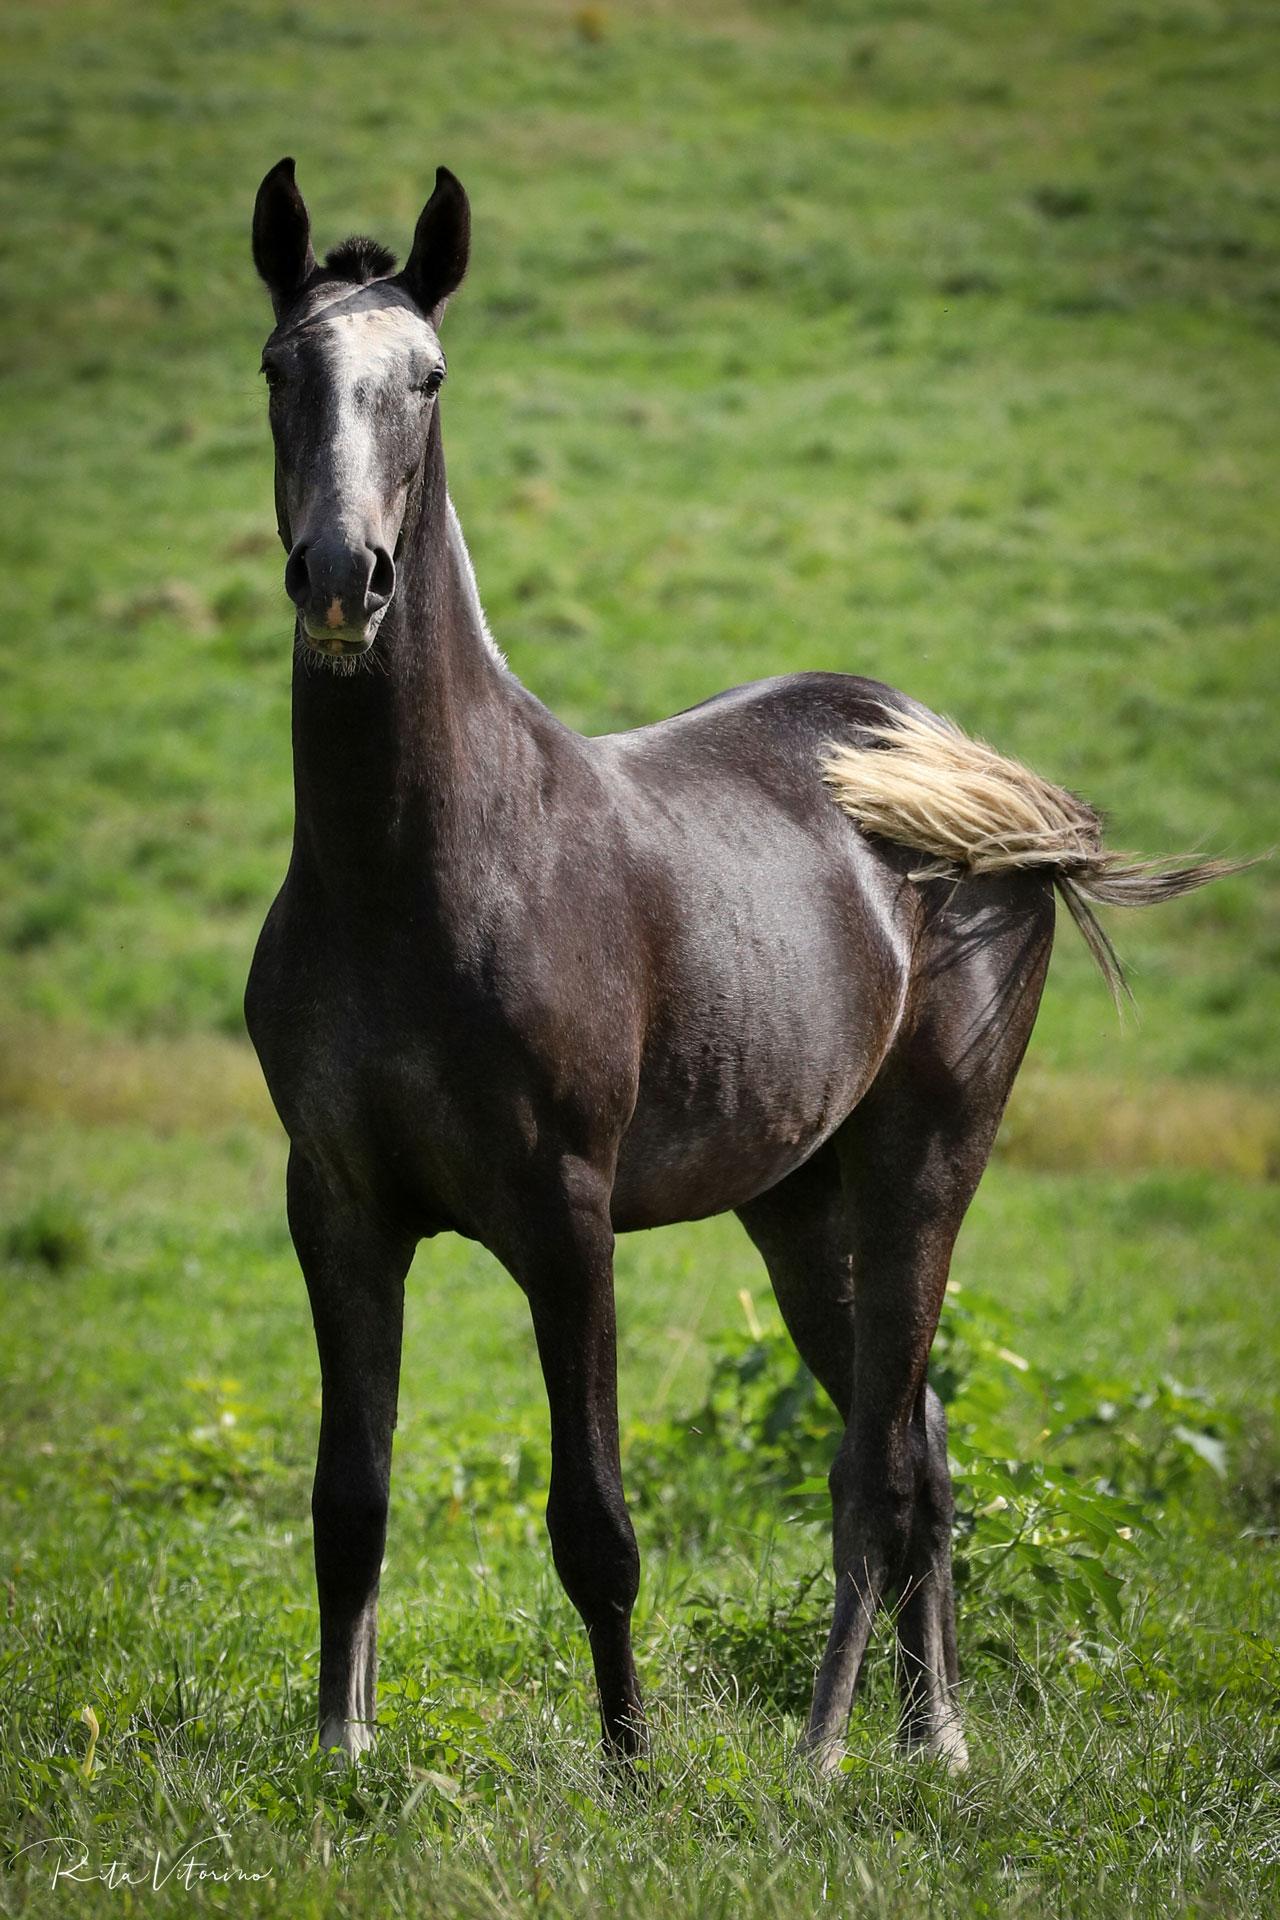 Piro free 1 YO colt with top genetics